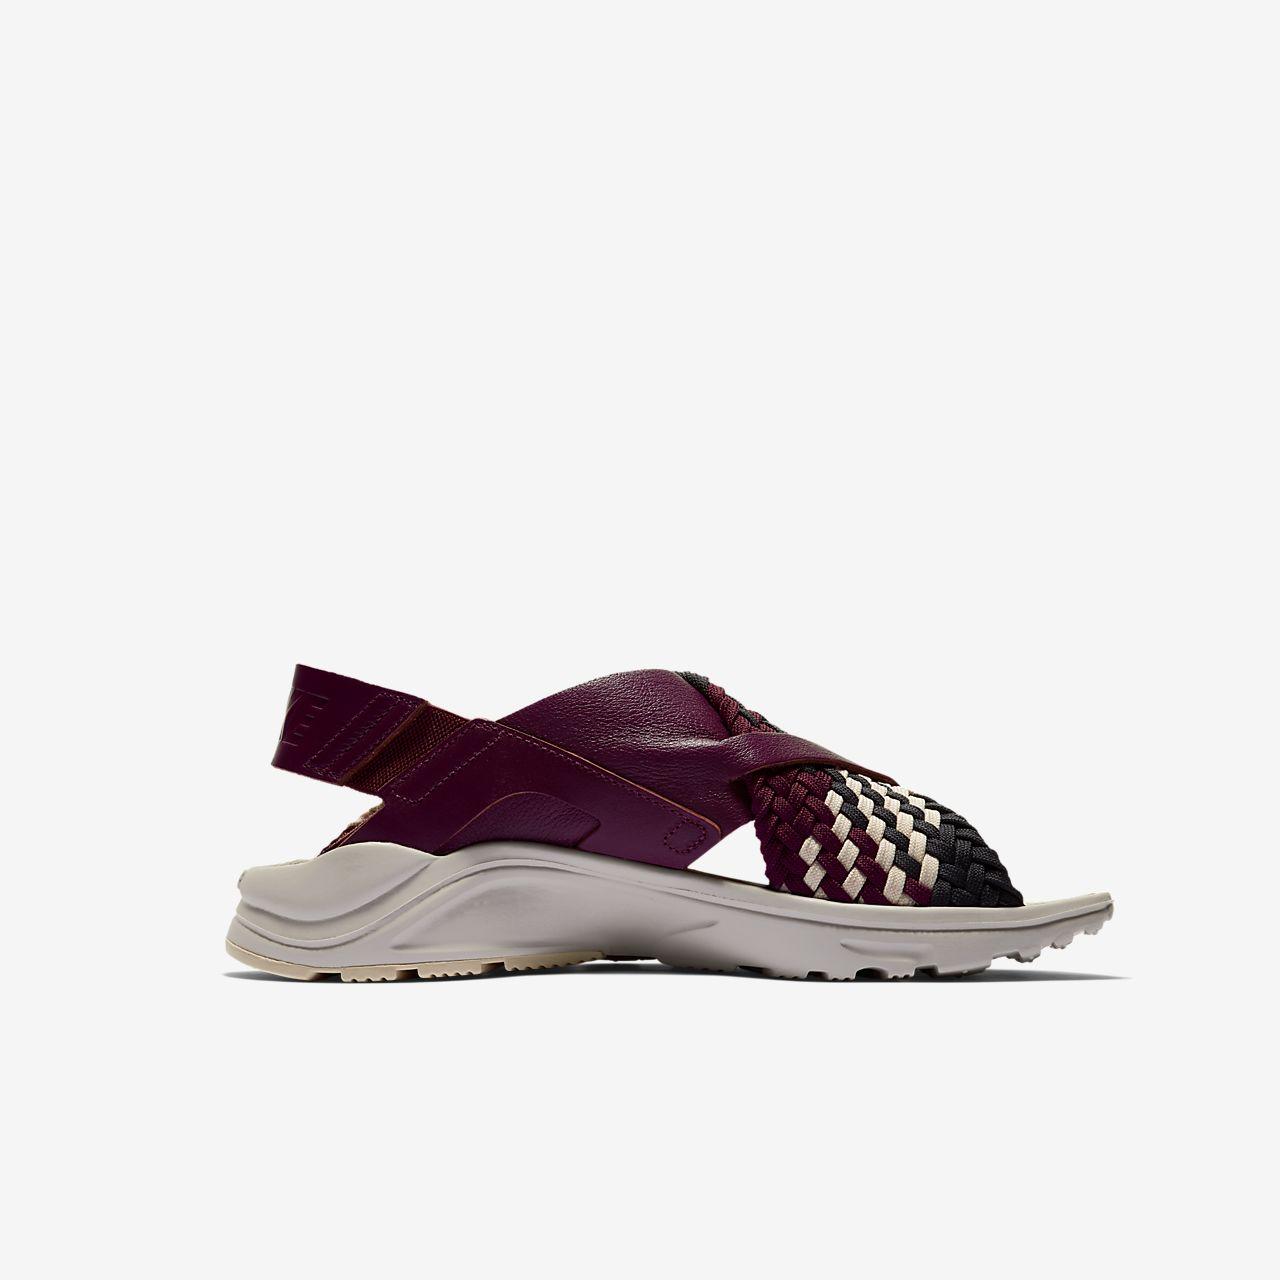 0a1570148a4a Nike Air Huarache Ultra Women s Sandal. Nike.com AE